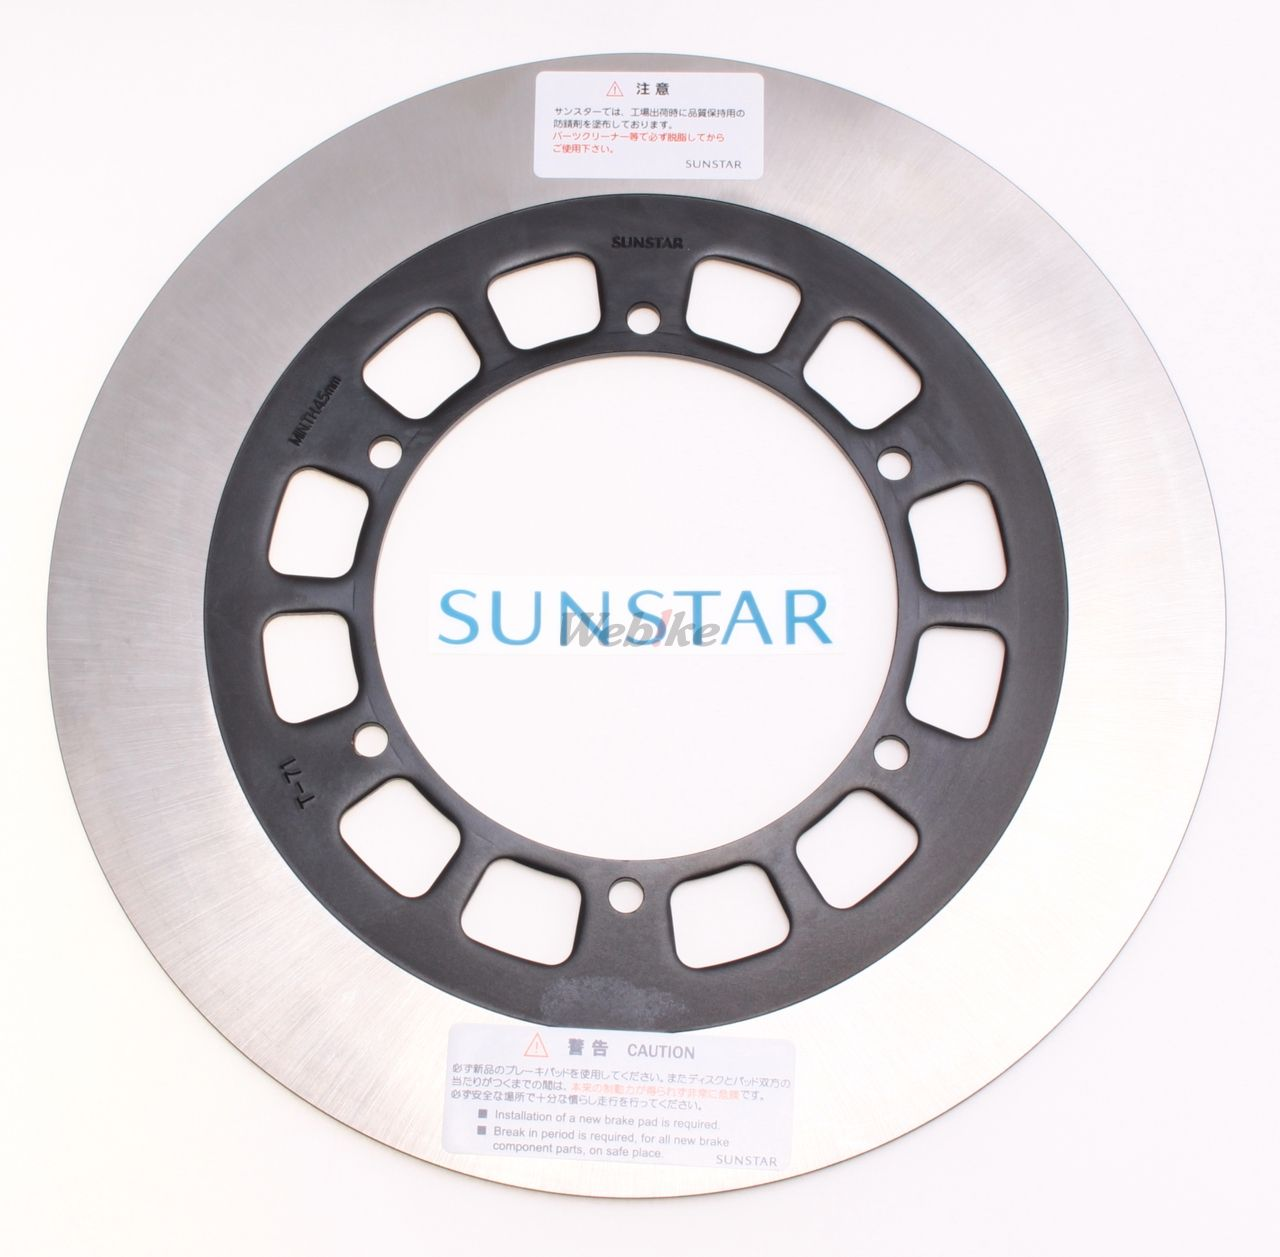 【SUNSTAR】傳統型TYPE for SR only 前煞車碟盤 - 「Webike-摩托百貨」